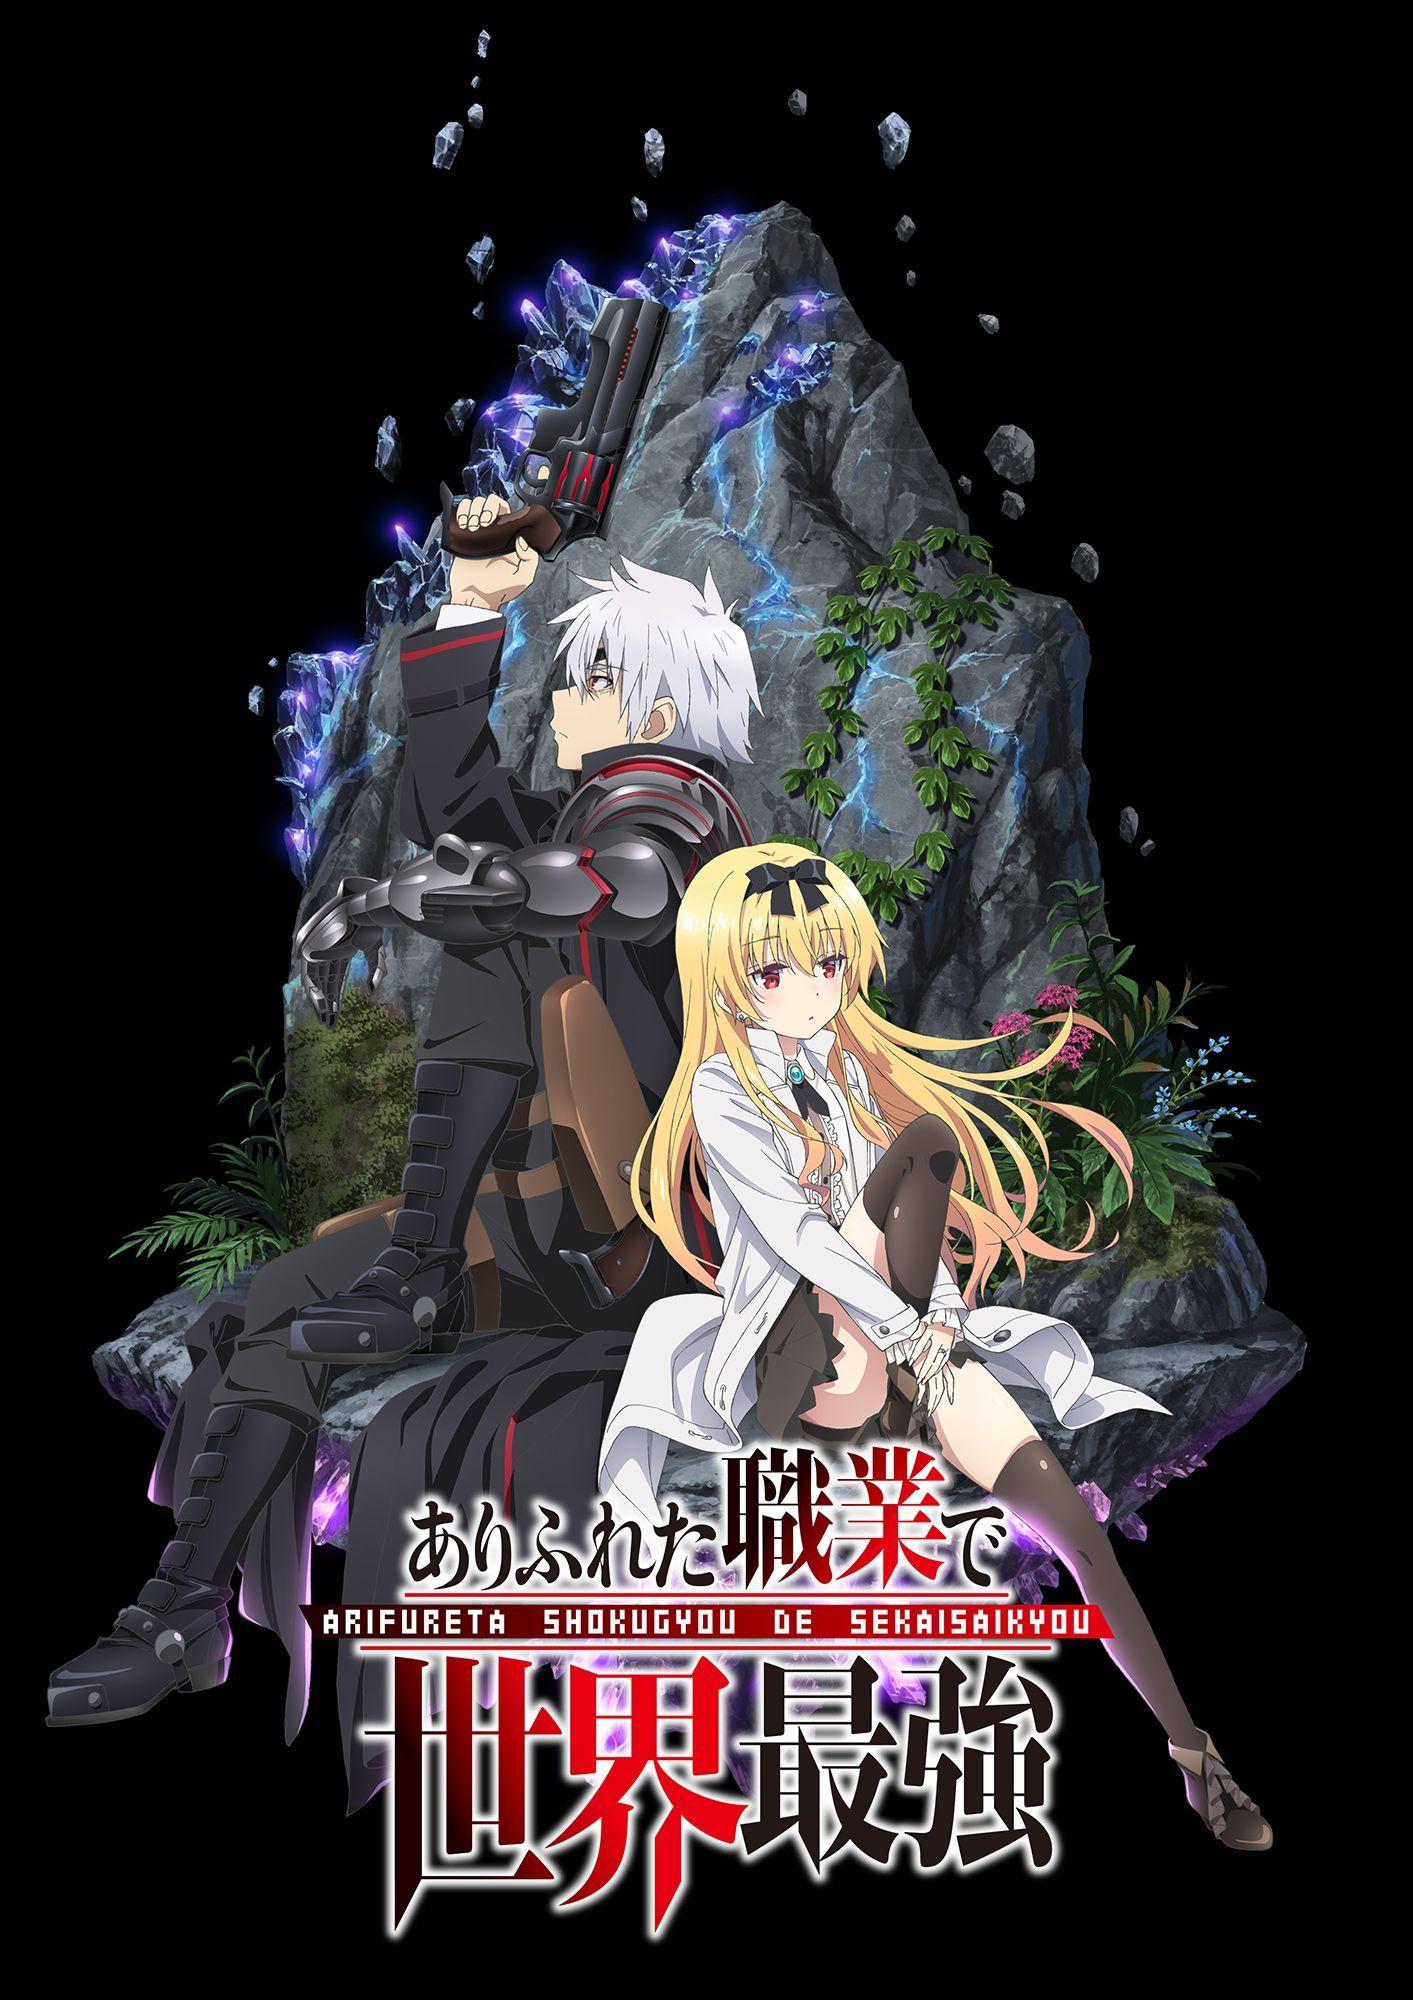 Anime Arifureta Shokugyō de Sekai Saikyō _ Personajes